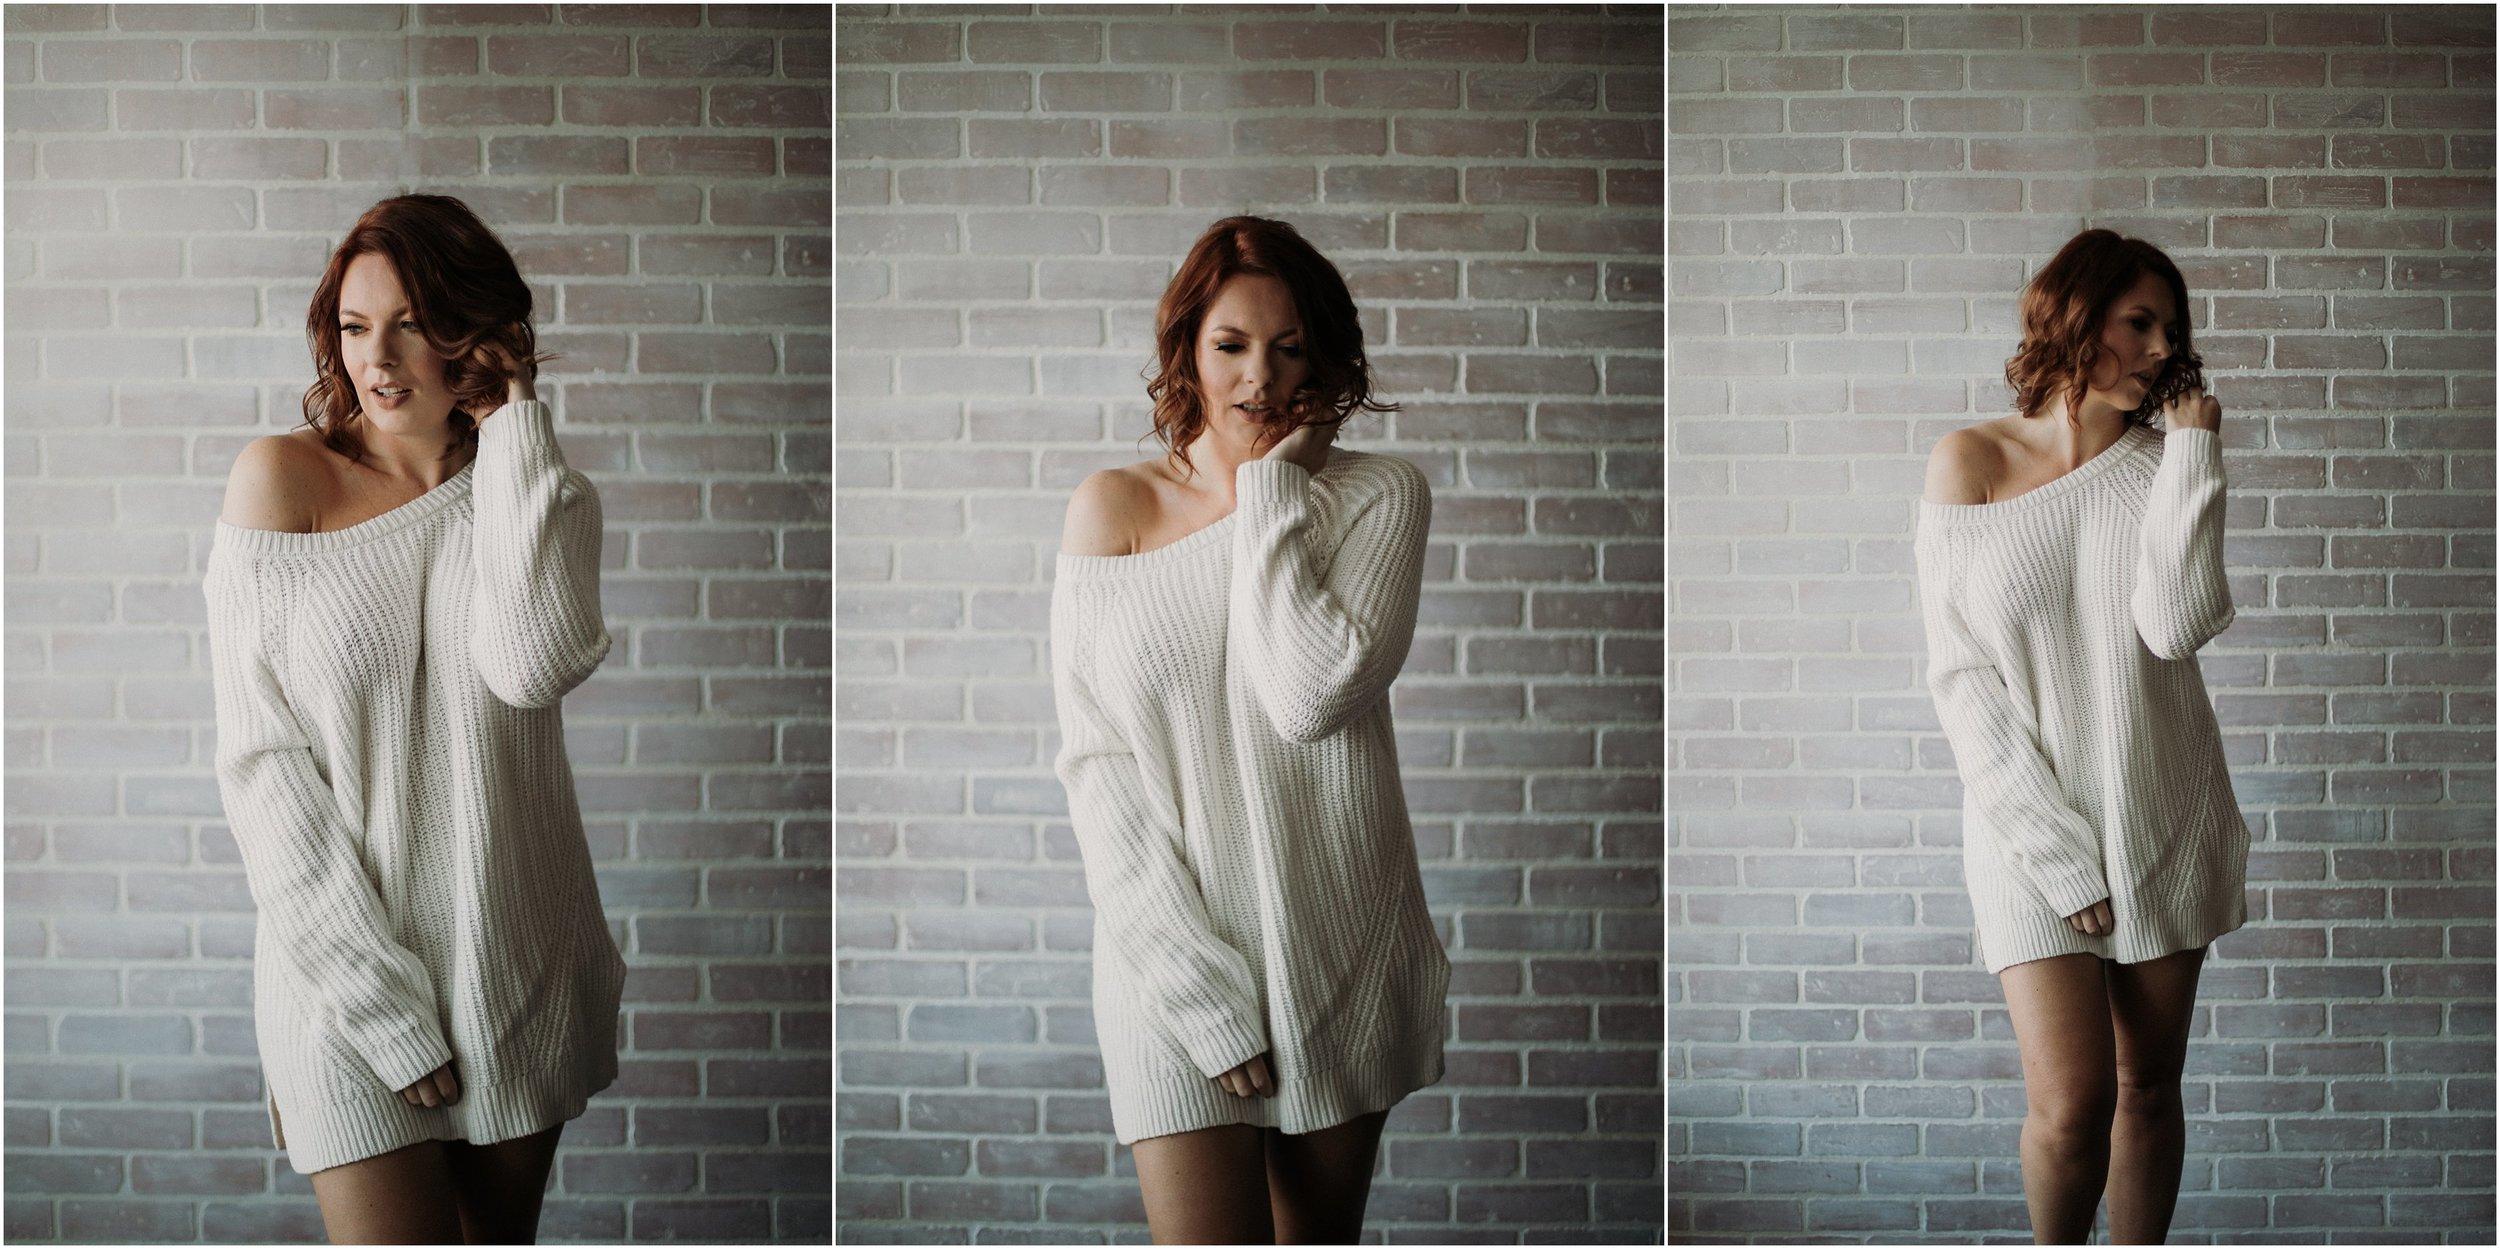 boudoir-photography-edmonton-Sara-Jewell-Photography